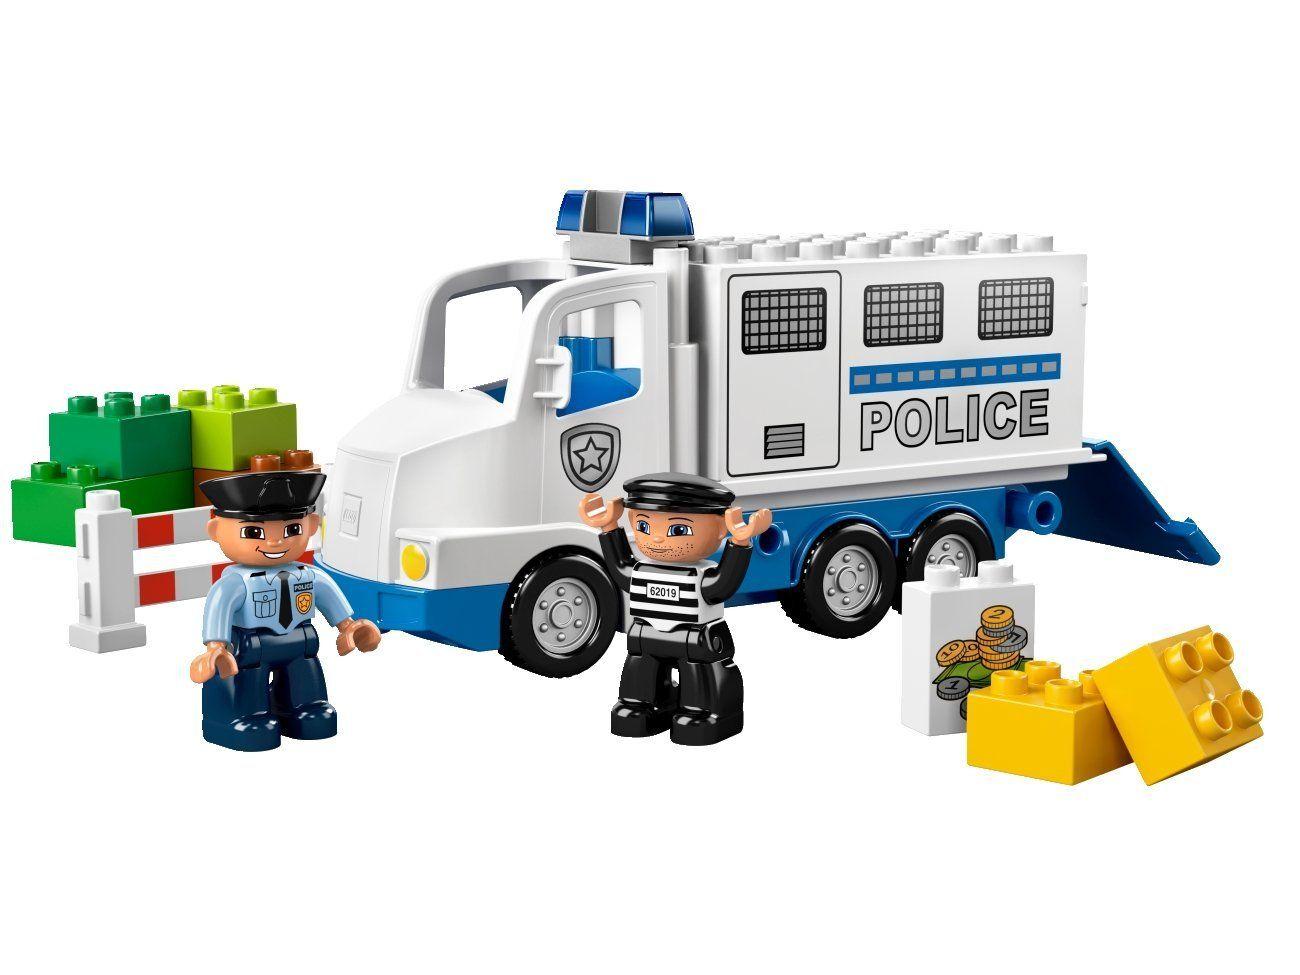 Image Result For Duplo Police Christian Lego Duplo Lego Police